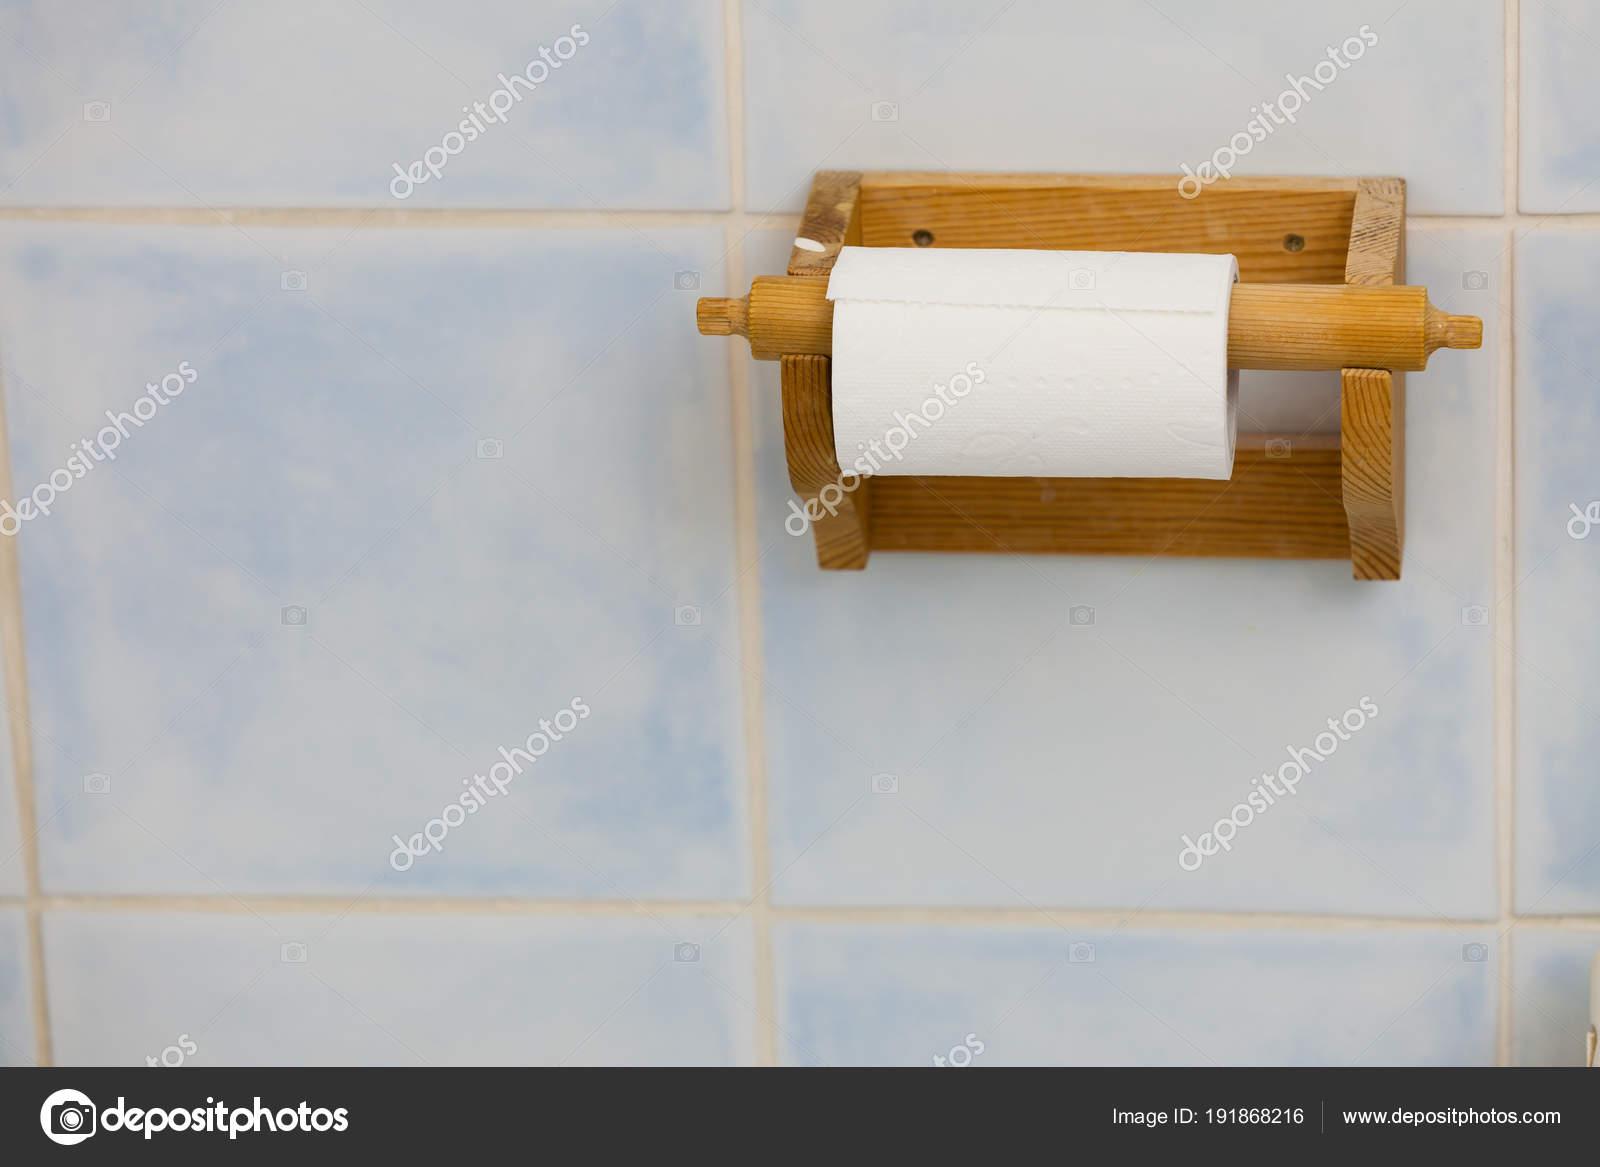 Holz Wc Papier Container Im Badezimmer Stockfoto C Voyagerix